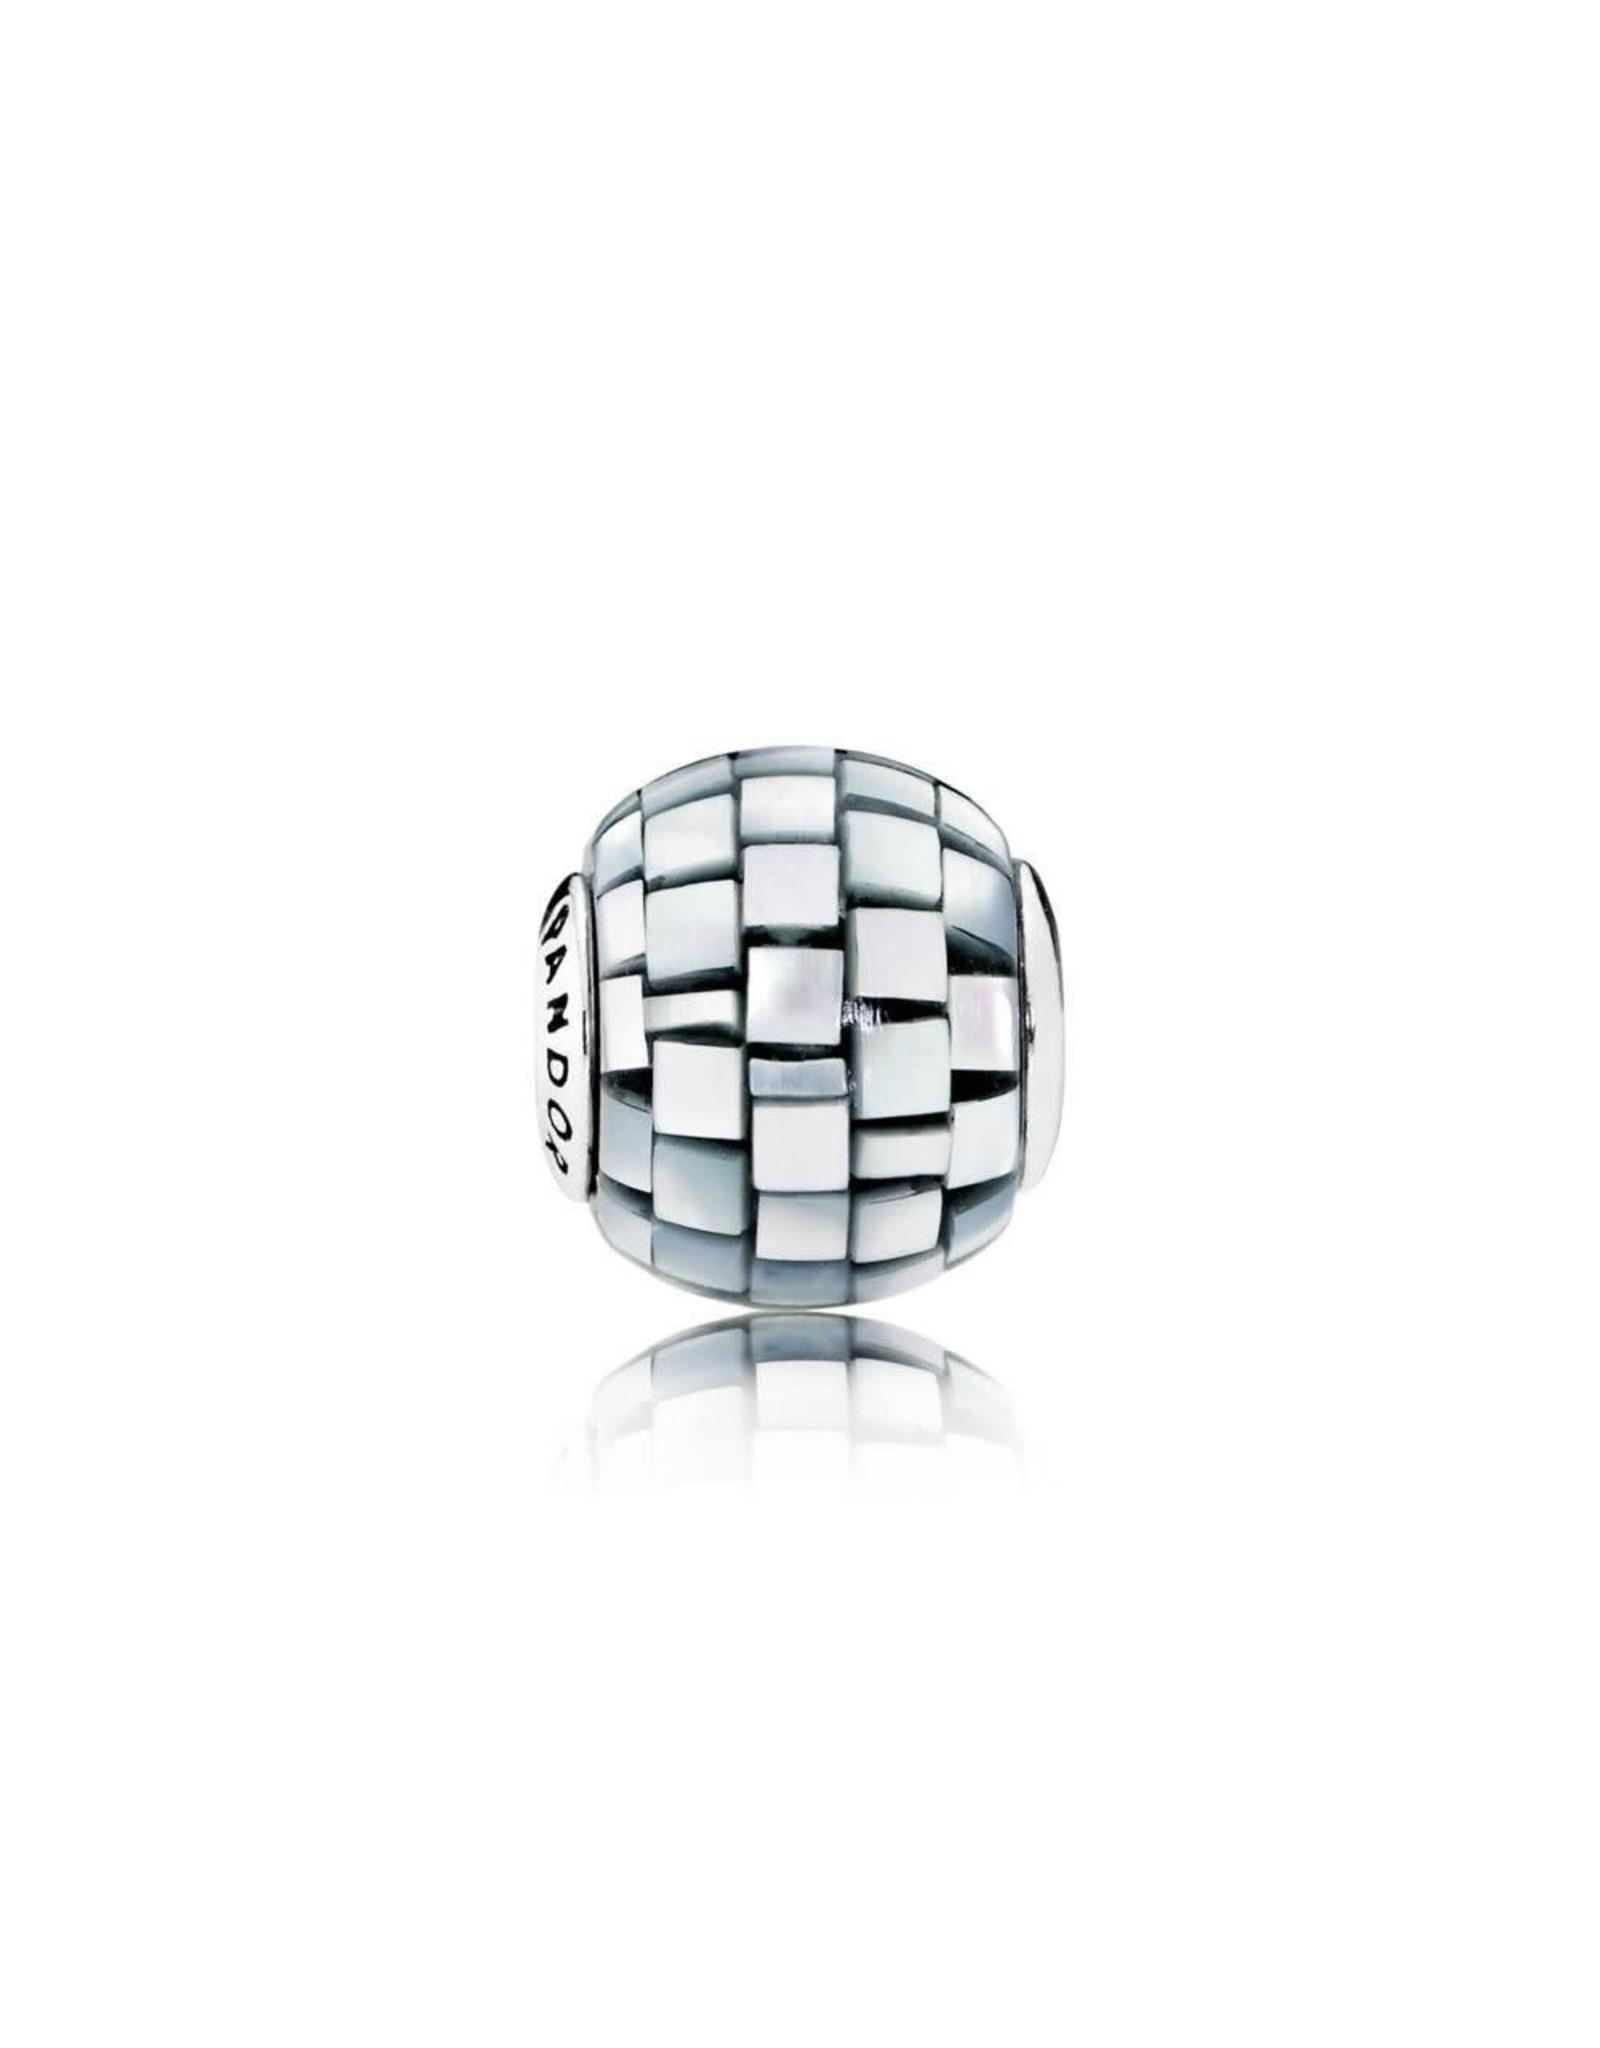 Pandora Pandora Essence Charm, Balance, Blue-Grey, Mother Of Pearl Mosaic